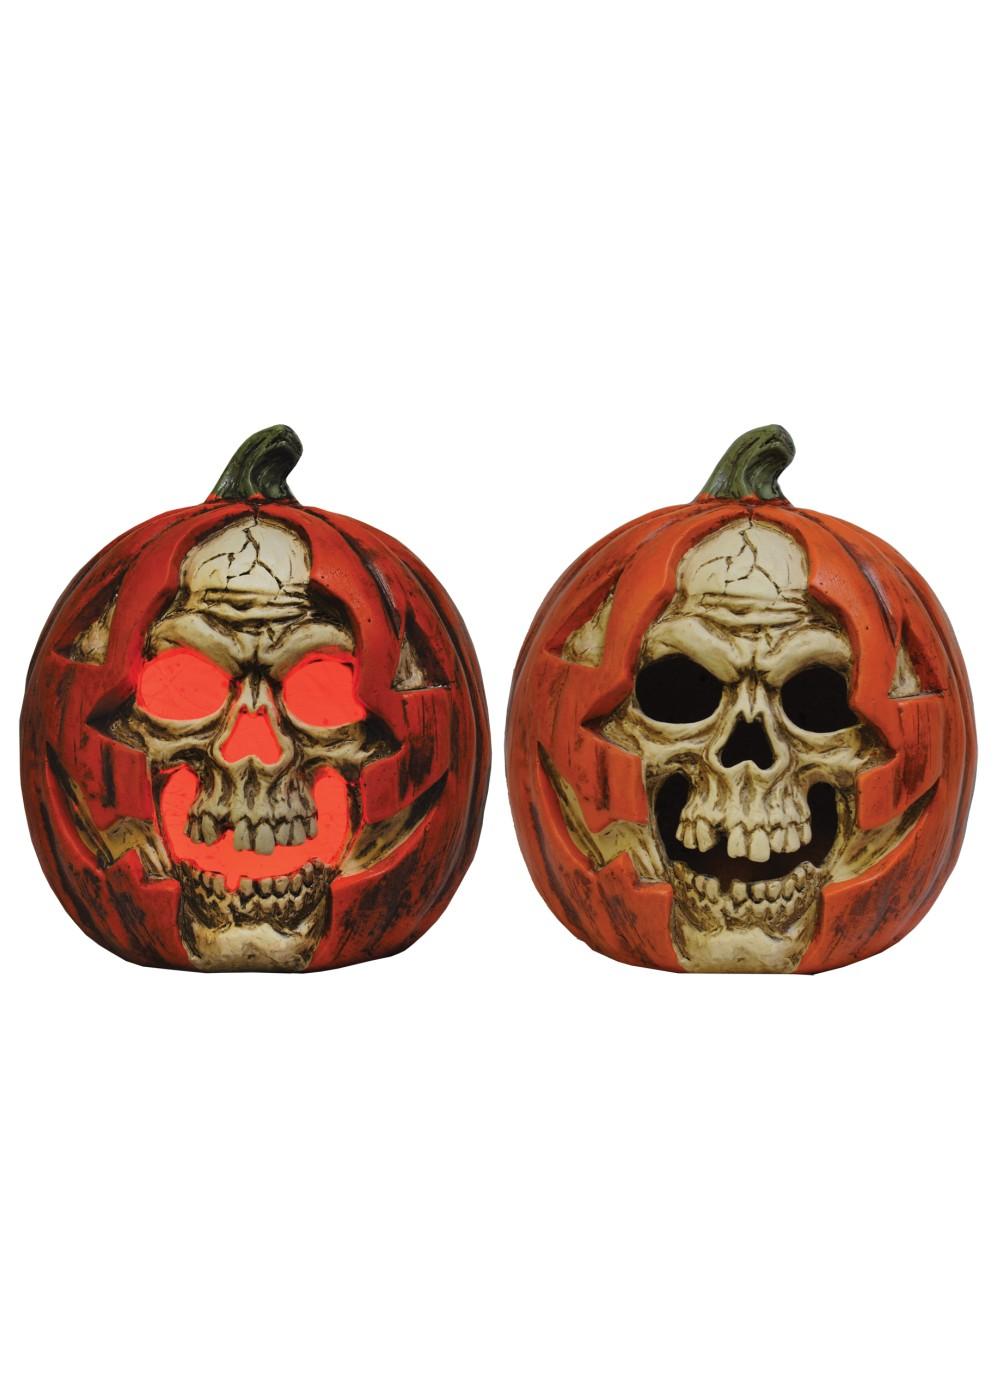 Lightup Skull Pumpkin Decoration Decorations